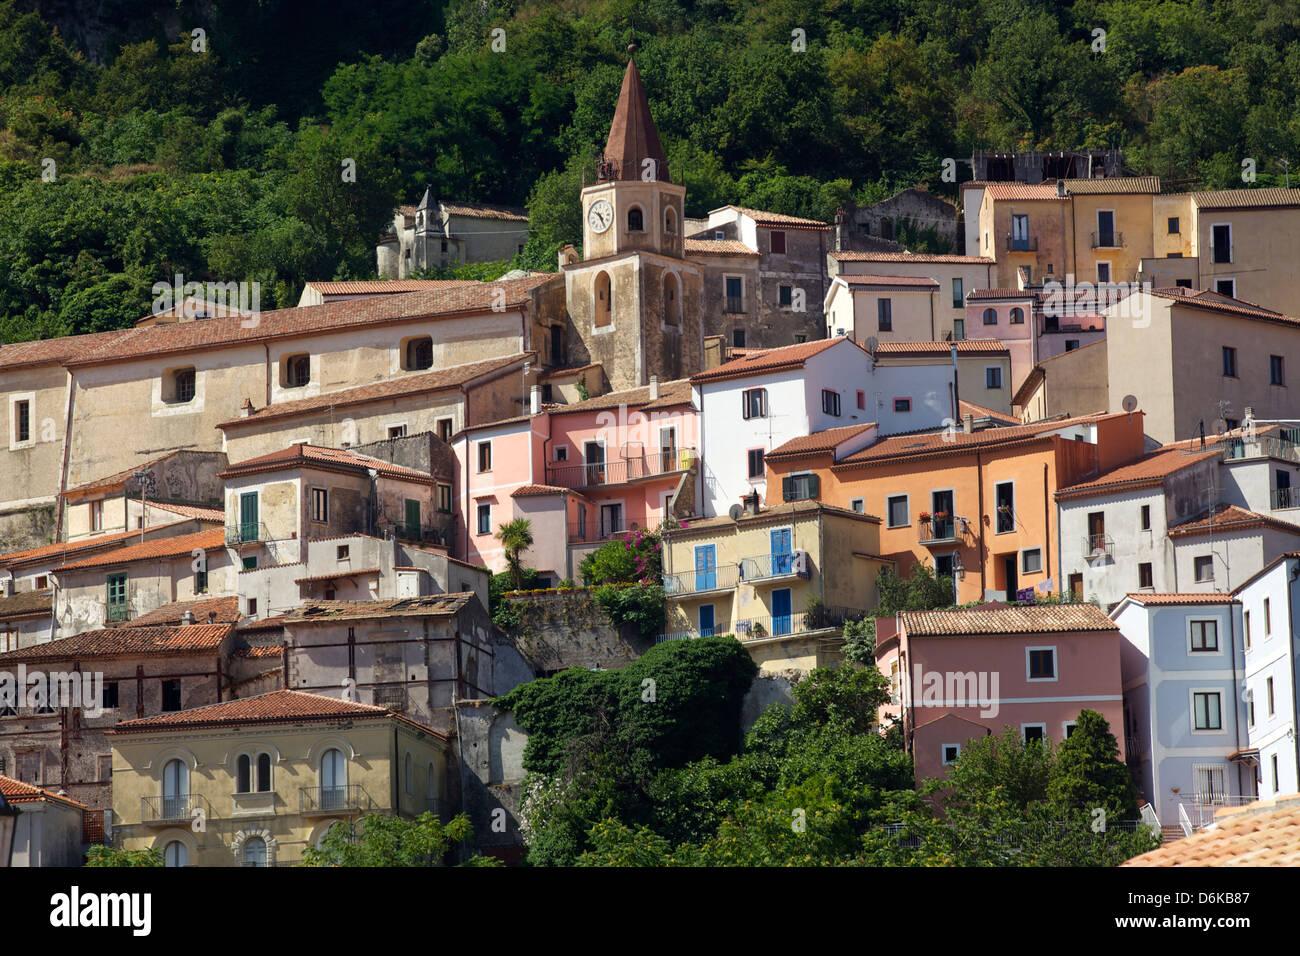 The small town of Maratea, on the Tyrrhenian Sea, Basilicata, Italy, Europe - Stock Image